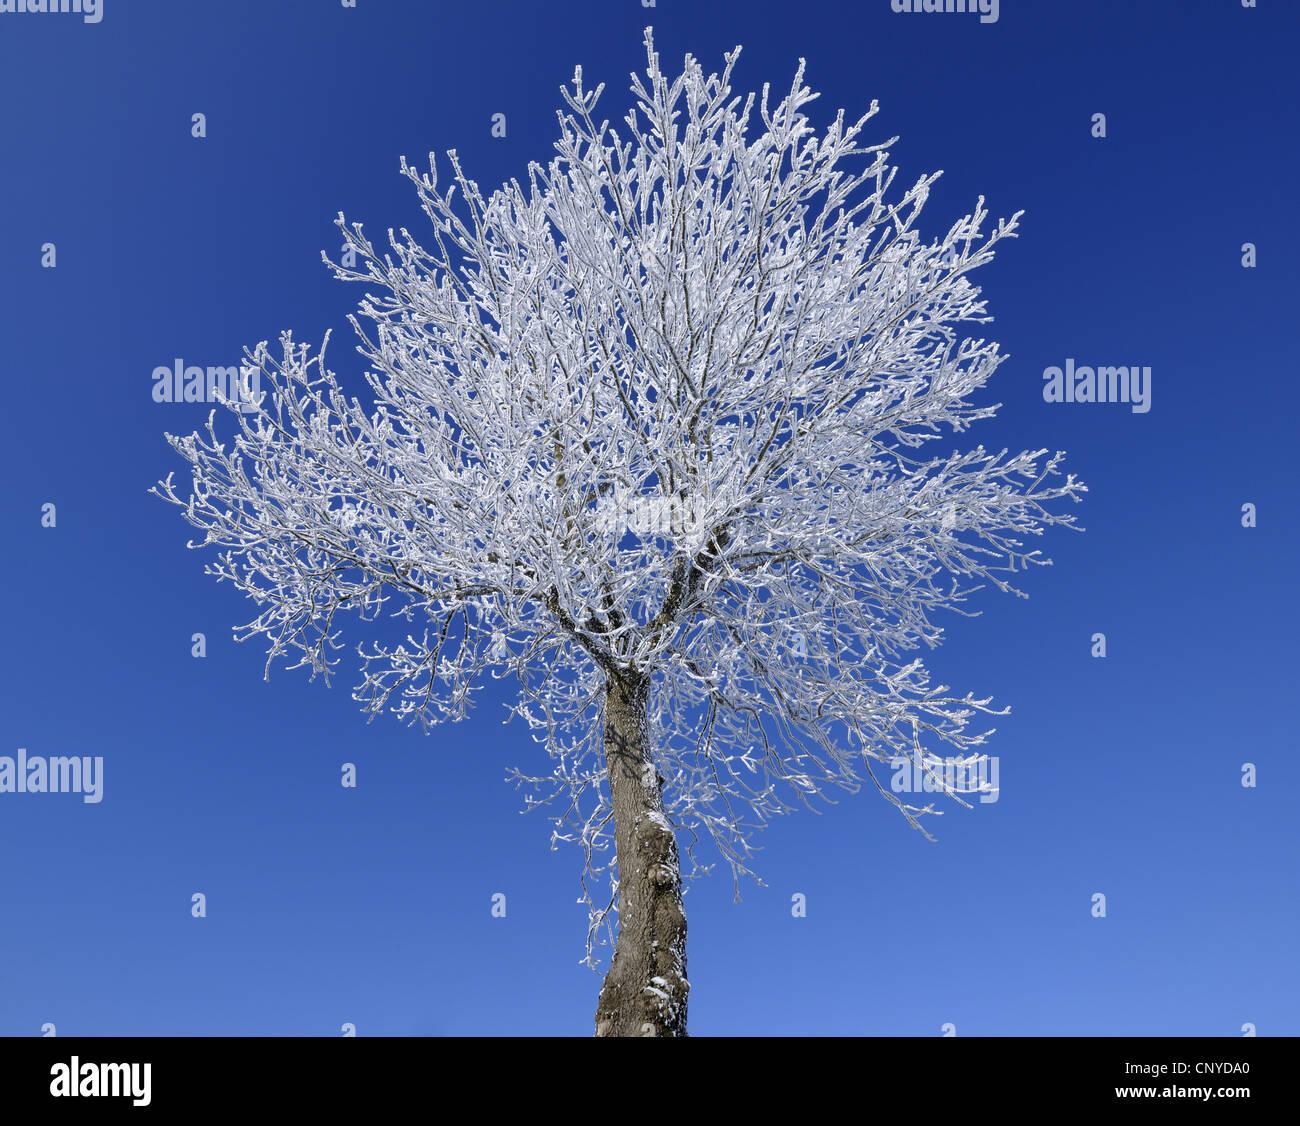 Singel tree con trasformata per forte gradiente gelo e cielo blu, Germania, Hesse, Rhoen Wasserkuppe, Immagini Stock